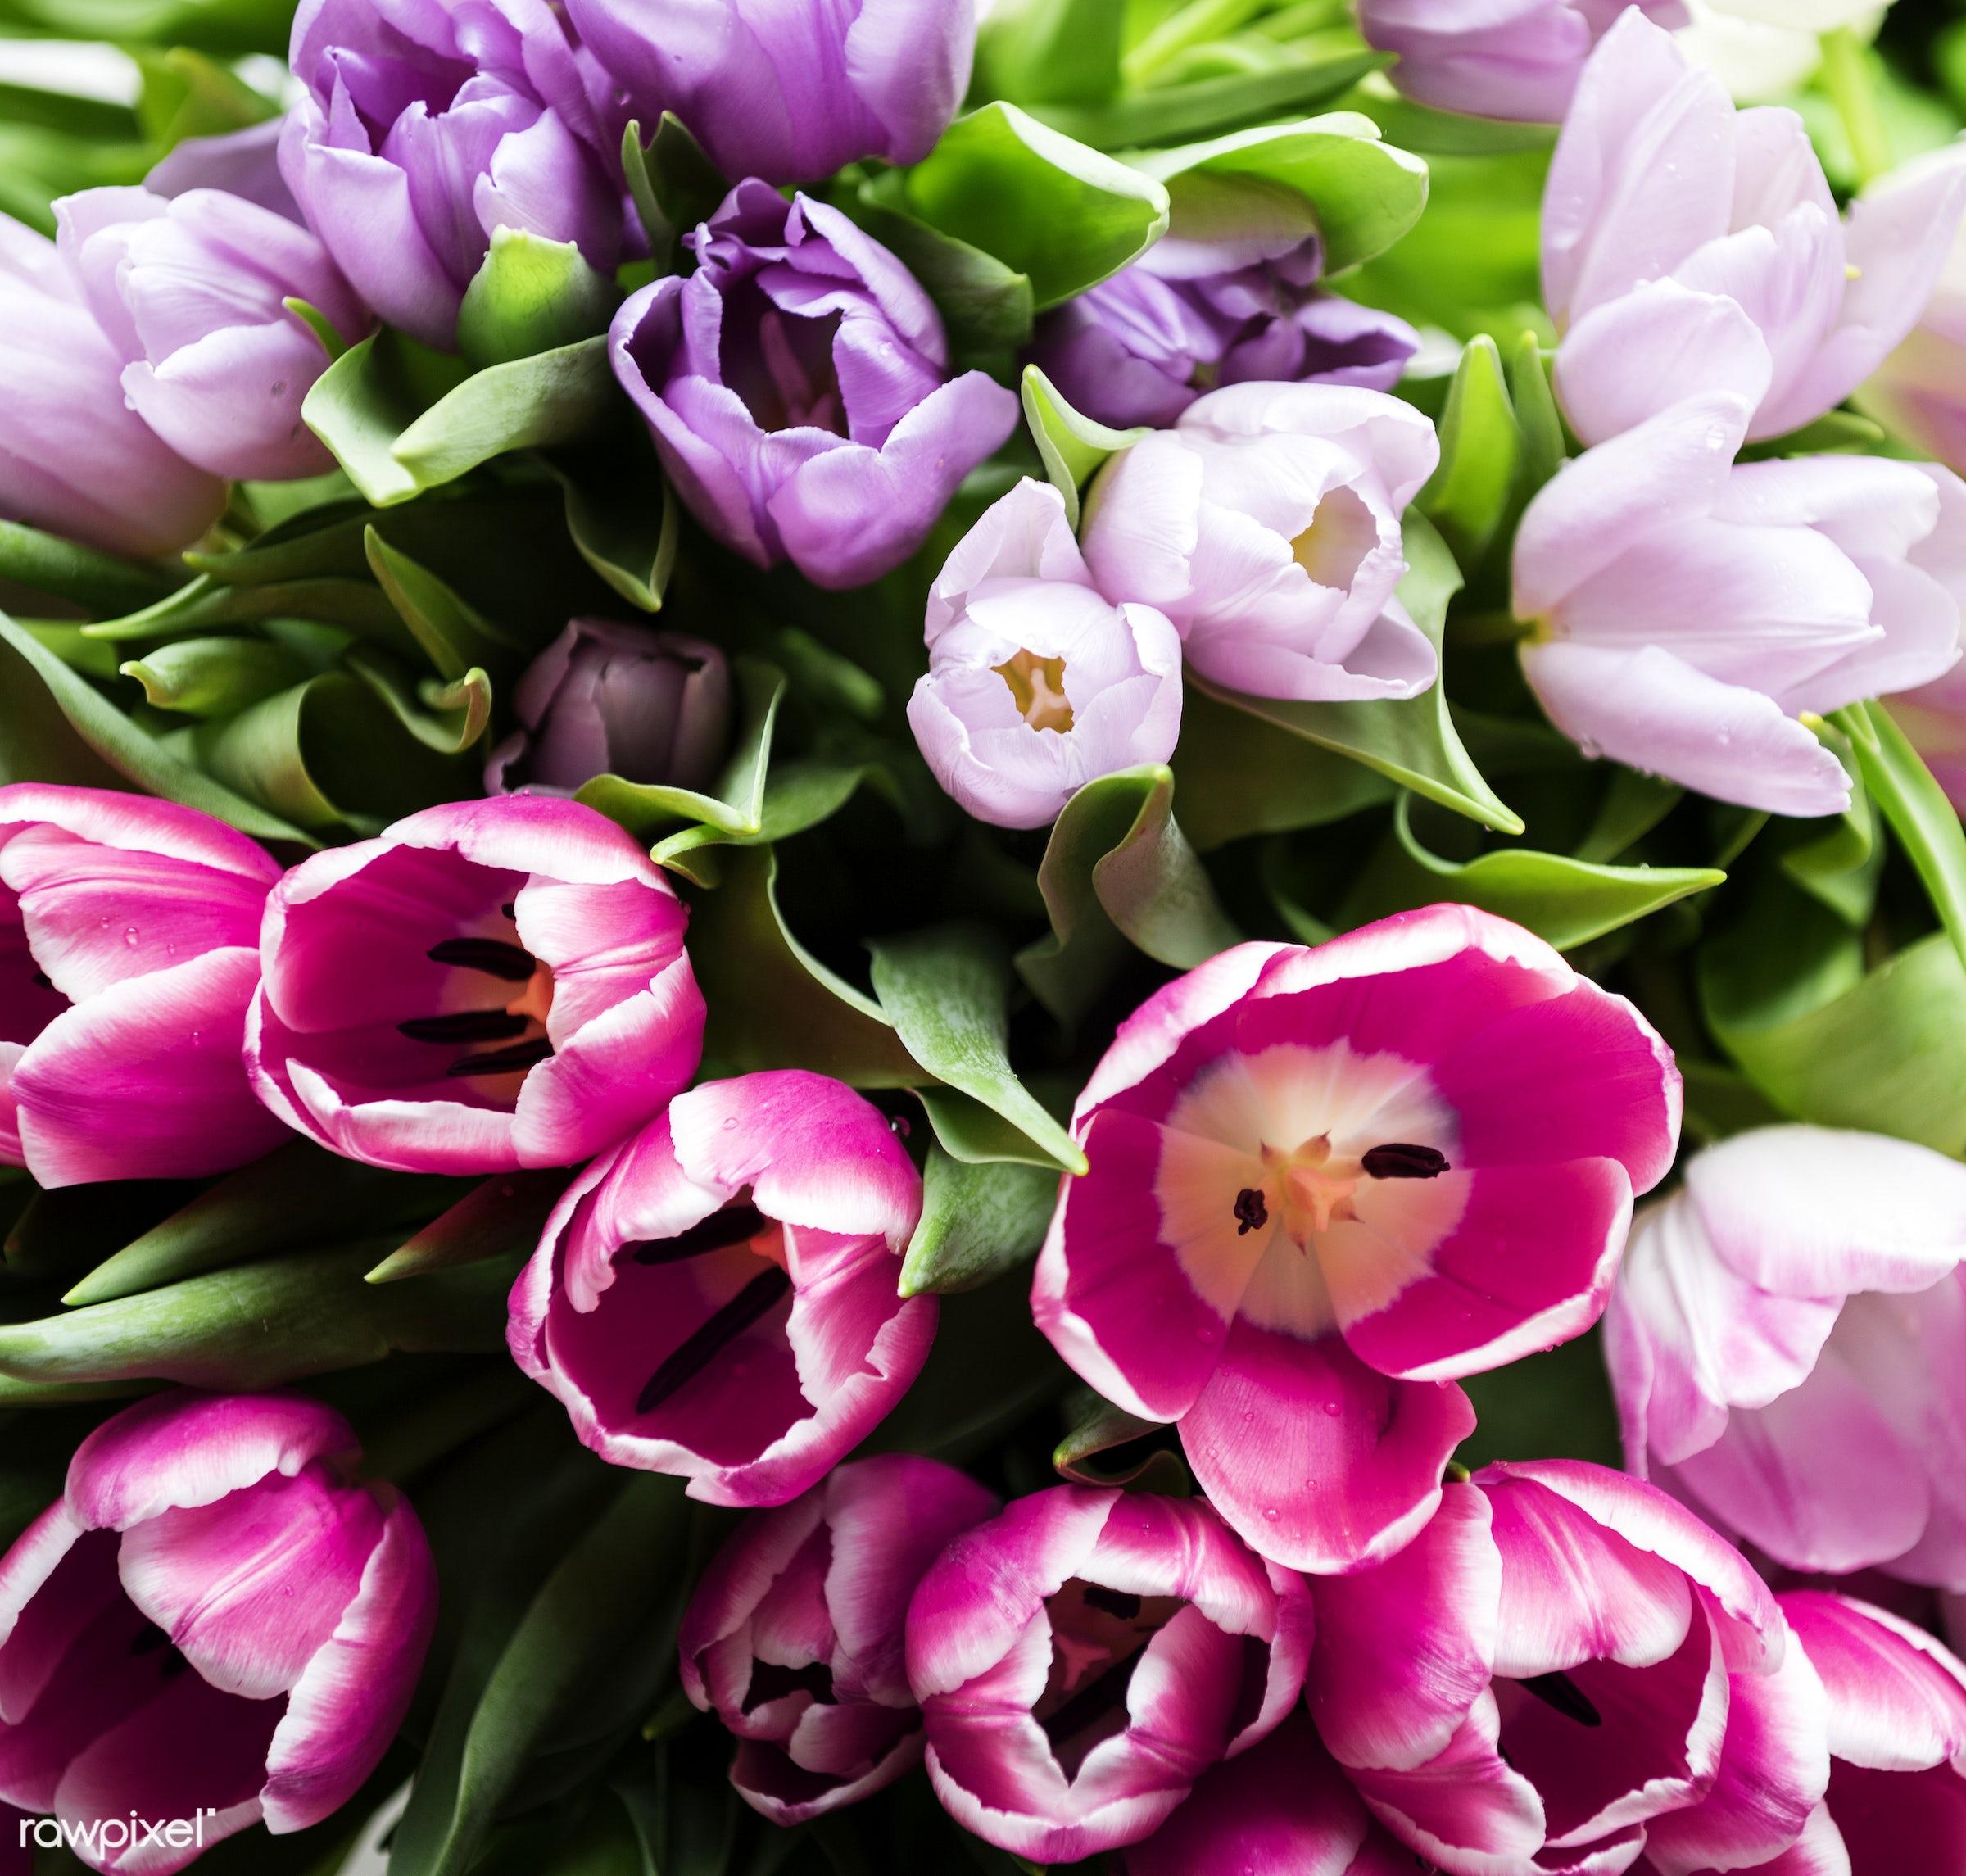 festive, nobody, detail, decorative, diverse, colorful, events, plants, leaf, tulips, leaves, spring, blossom, decor, nature...